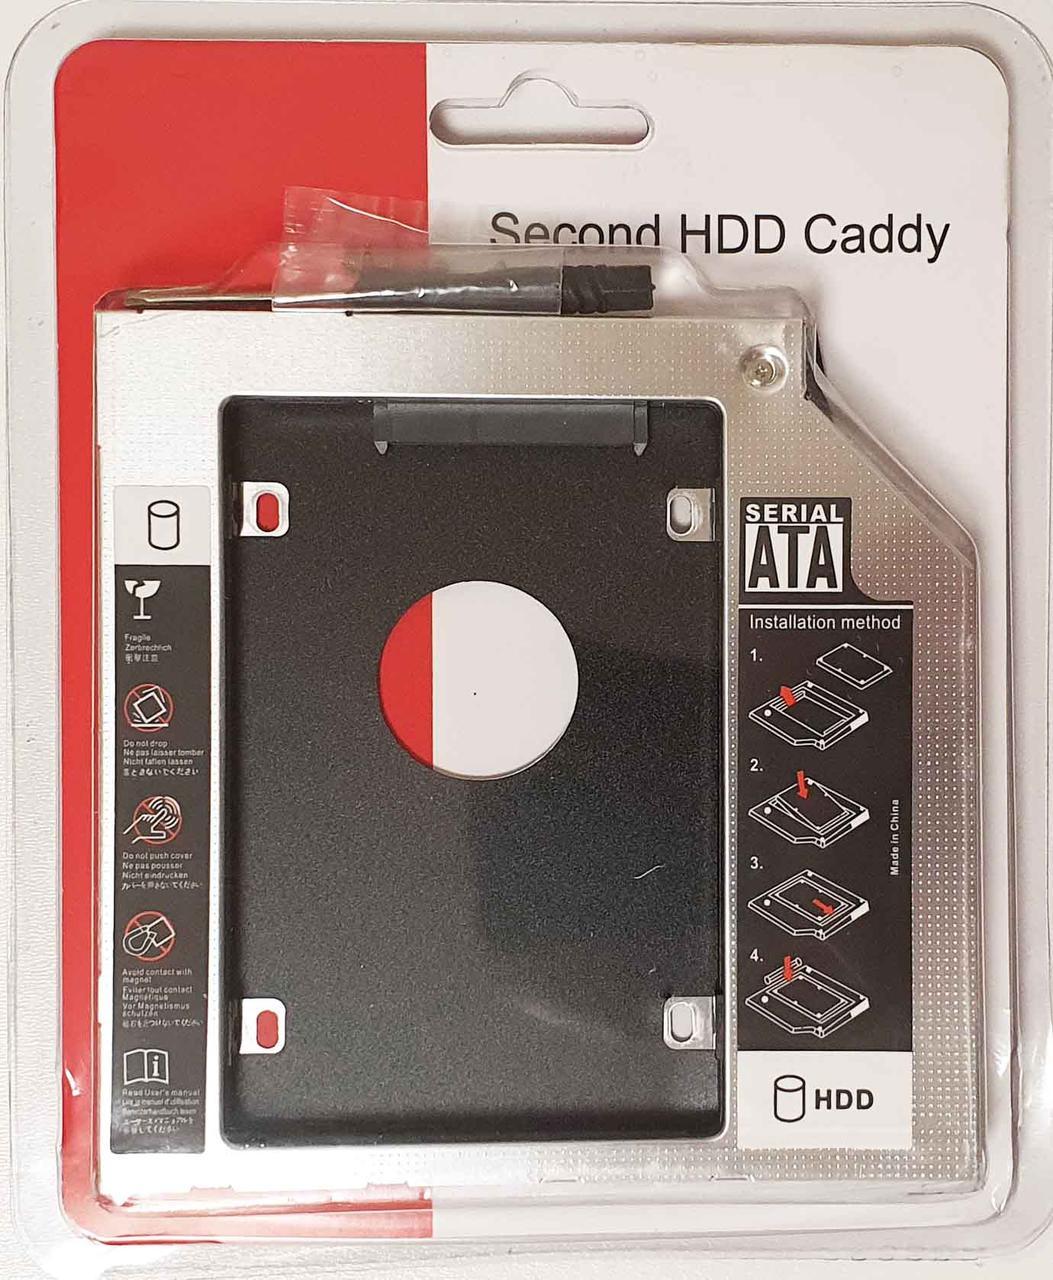 10 шт. Карман для установки второго жесткого диска SATA в отсек DVD 9.5 мм SATA (optibay caddy) алюминий